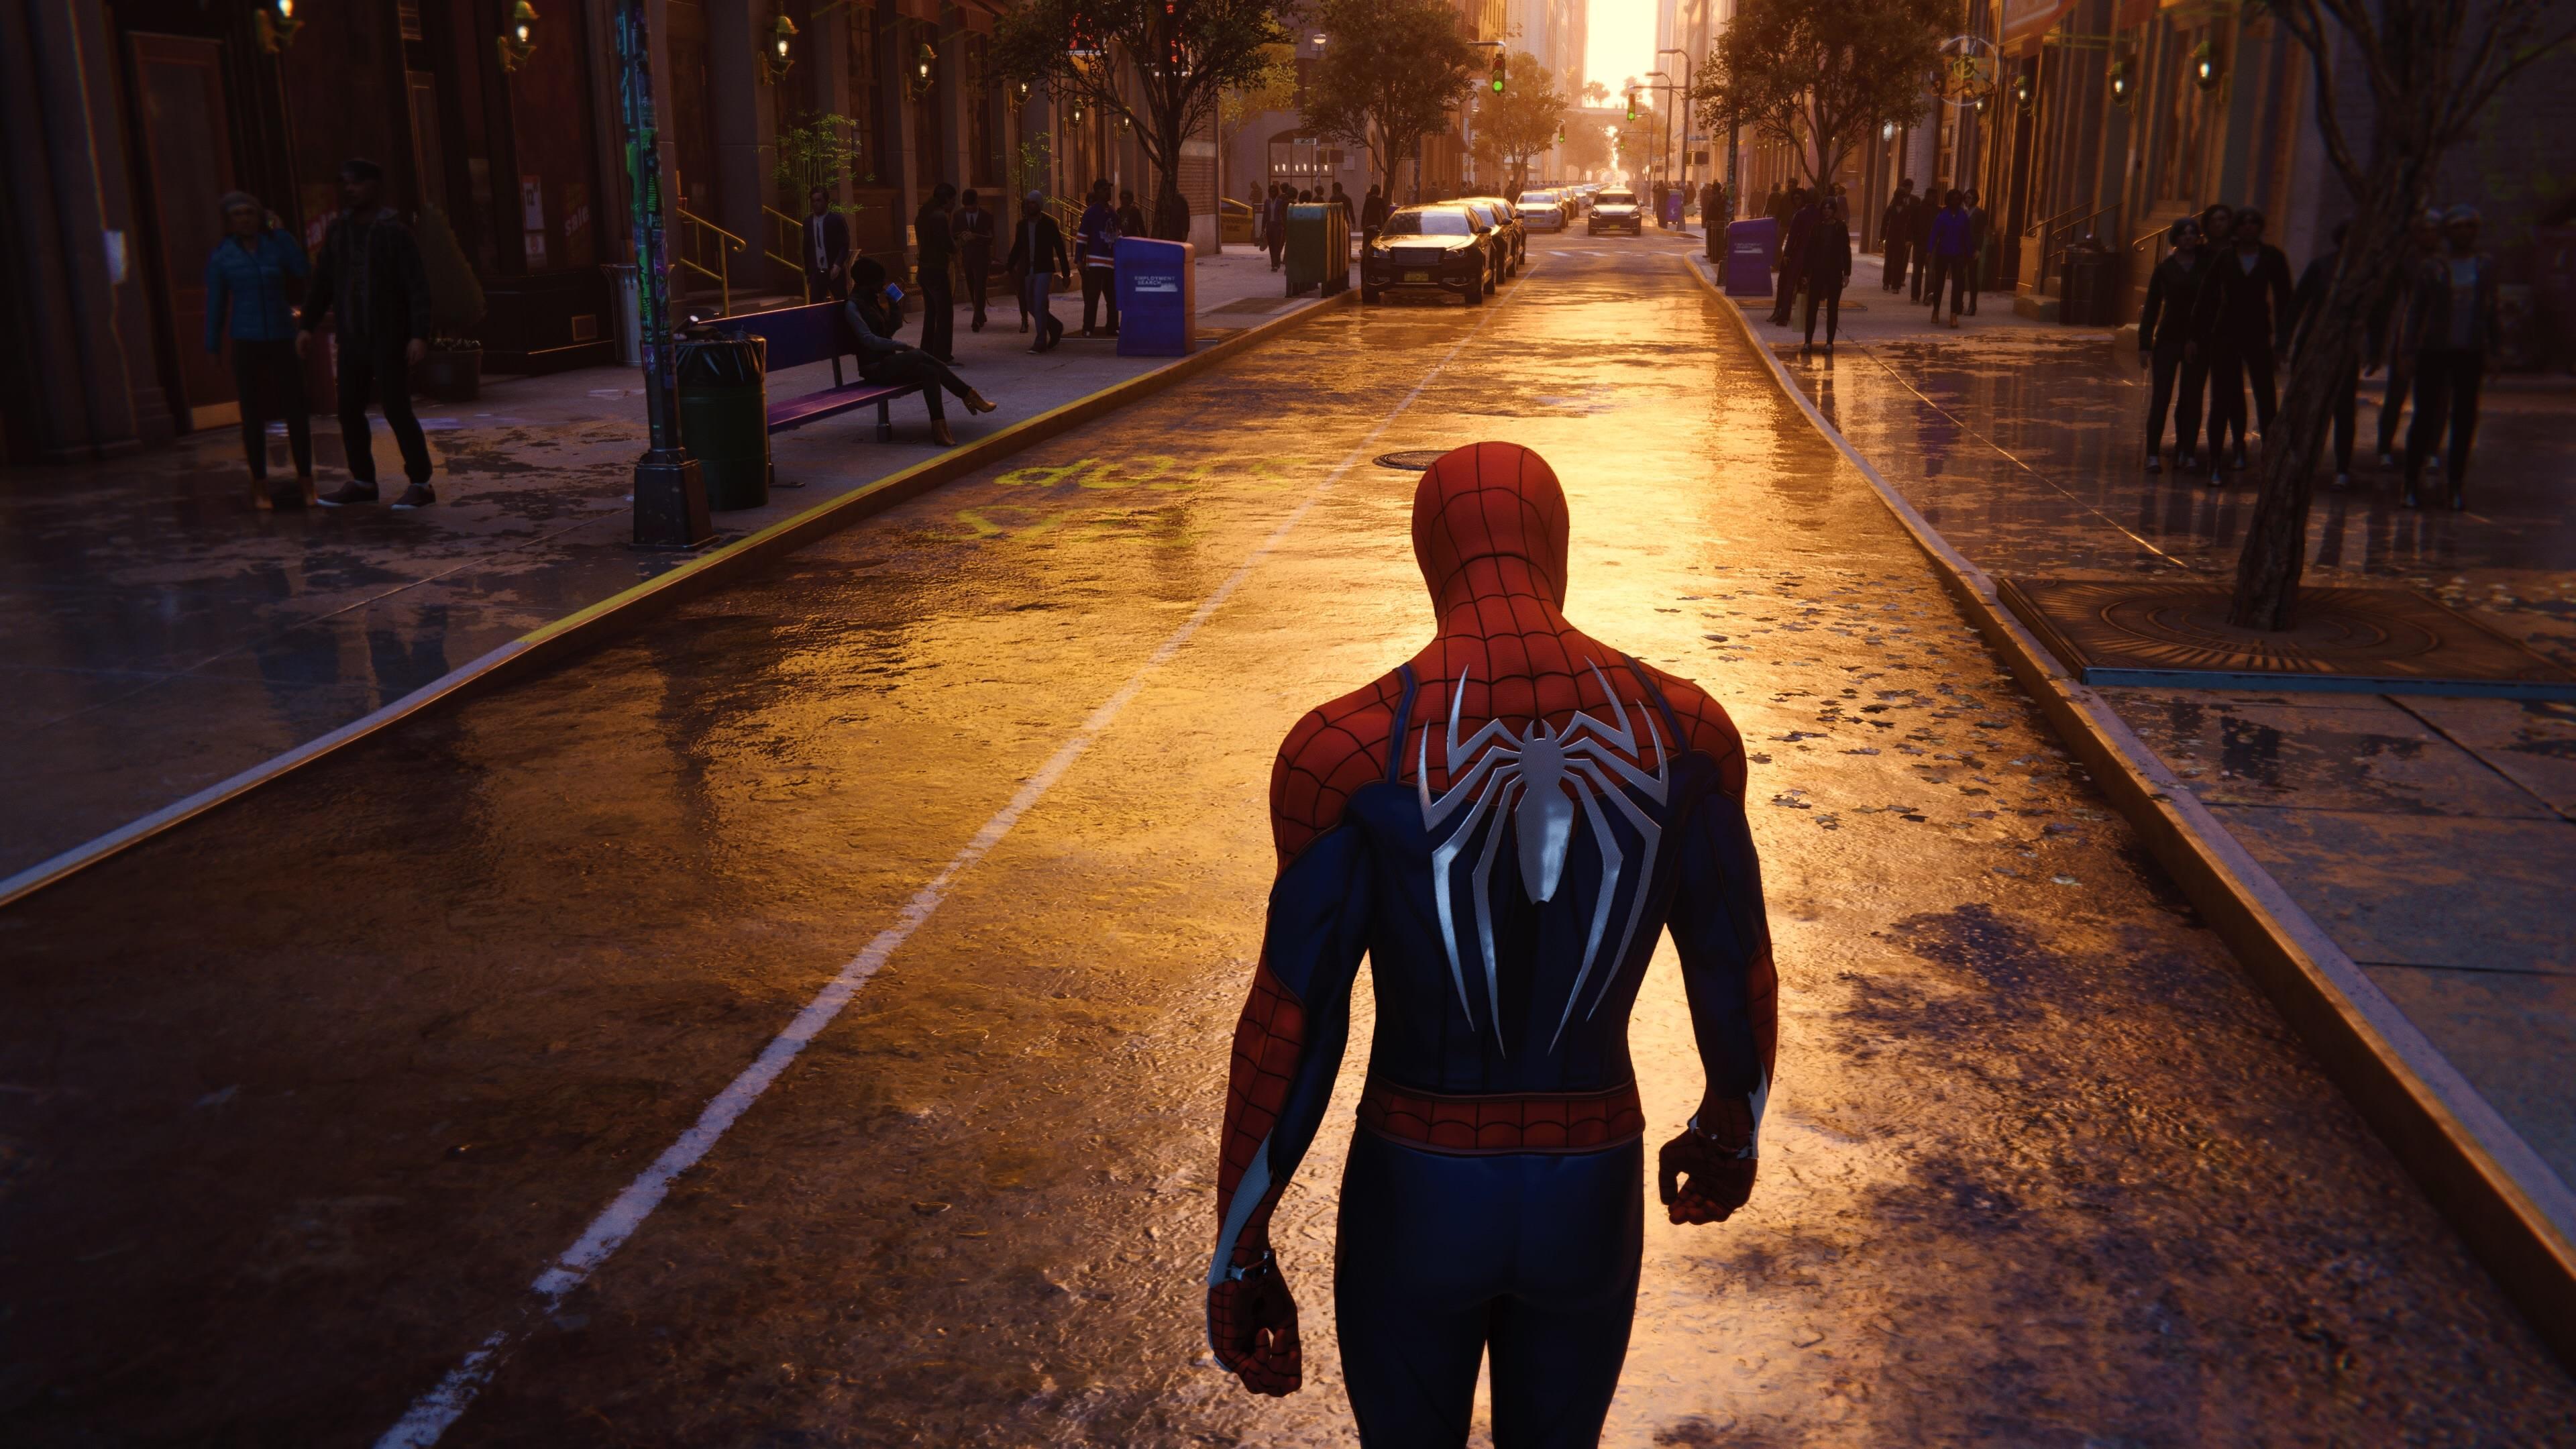 spiderman walking in nyc streets 1539978564 - Spiderman Walking In NYC Streets - superheroes wallpapers, spiderman wallpapers, hd-wallpapers, 4k-wallpapers